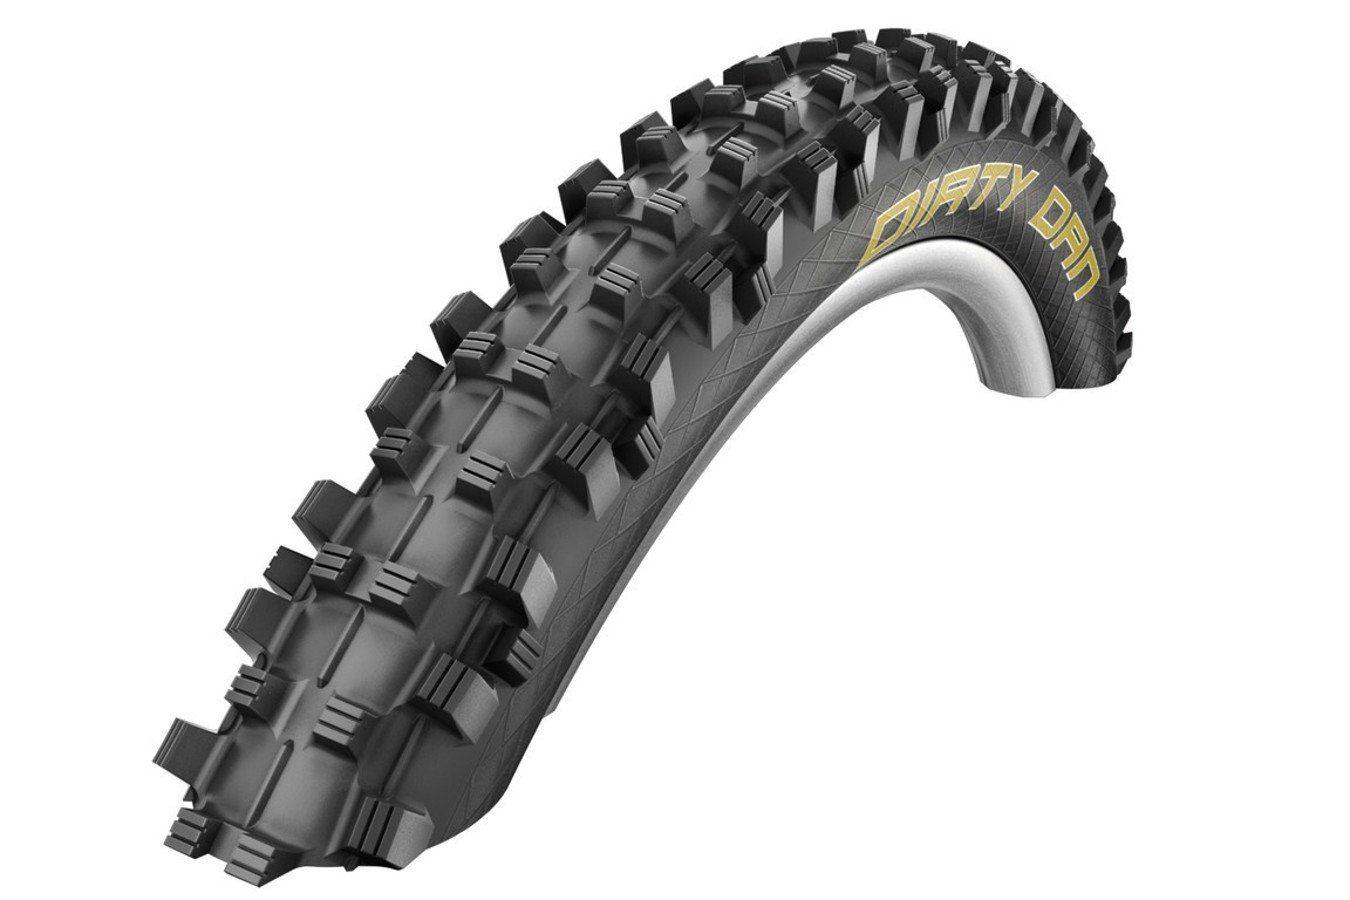 Schwalbe Fahrradreifen »Dirty Dan EVO 27.5 x 2.35 SuperG TLE VertStar«